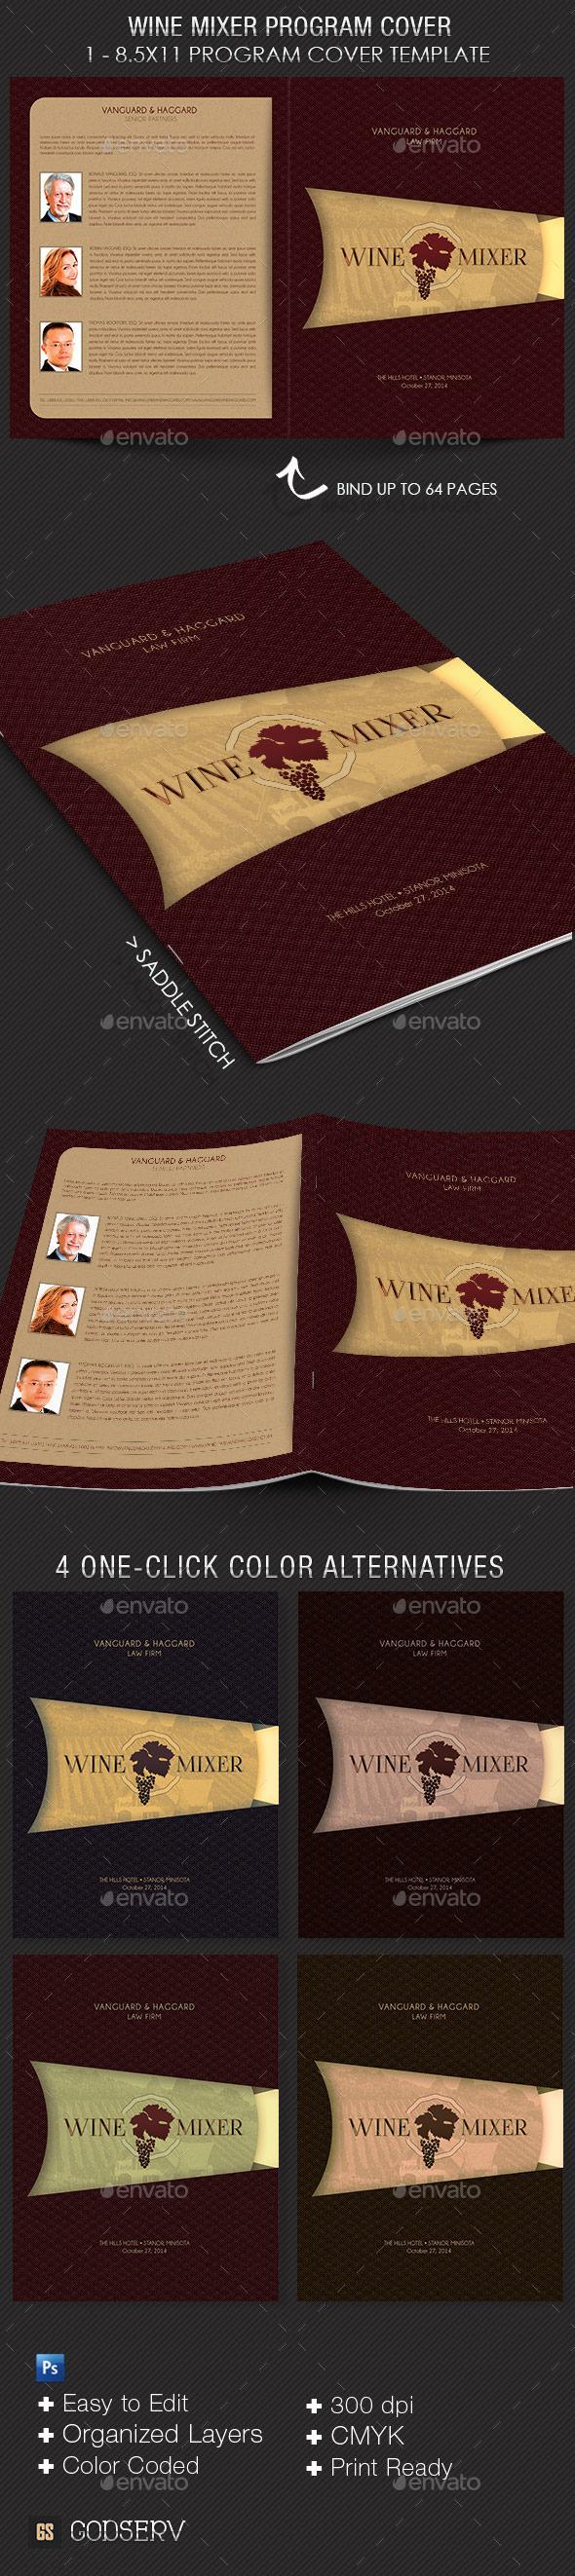 Wine Chocolate Mixer Program Cover Template - Informational Brochures